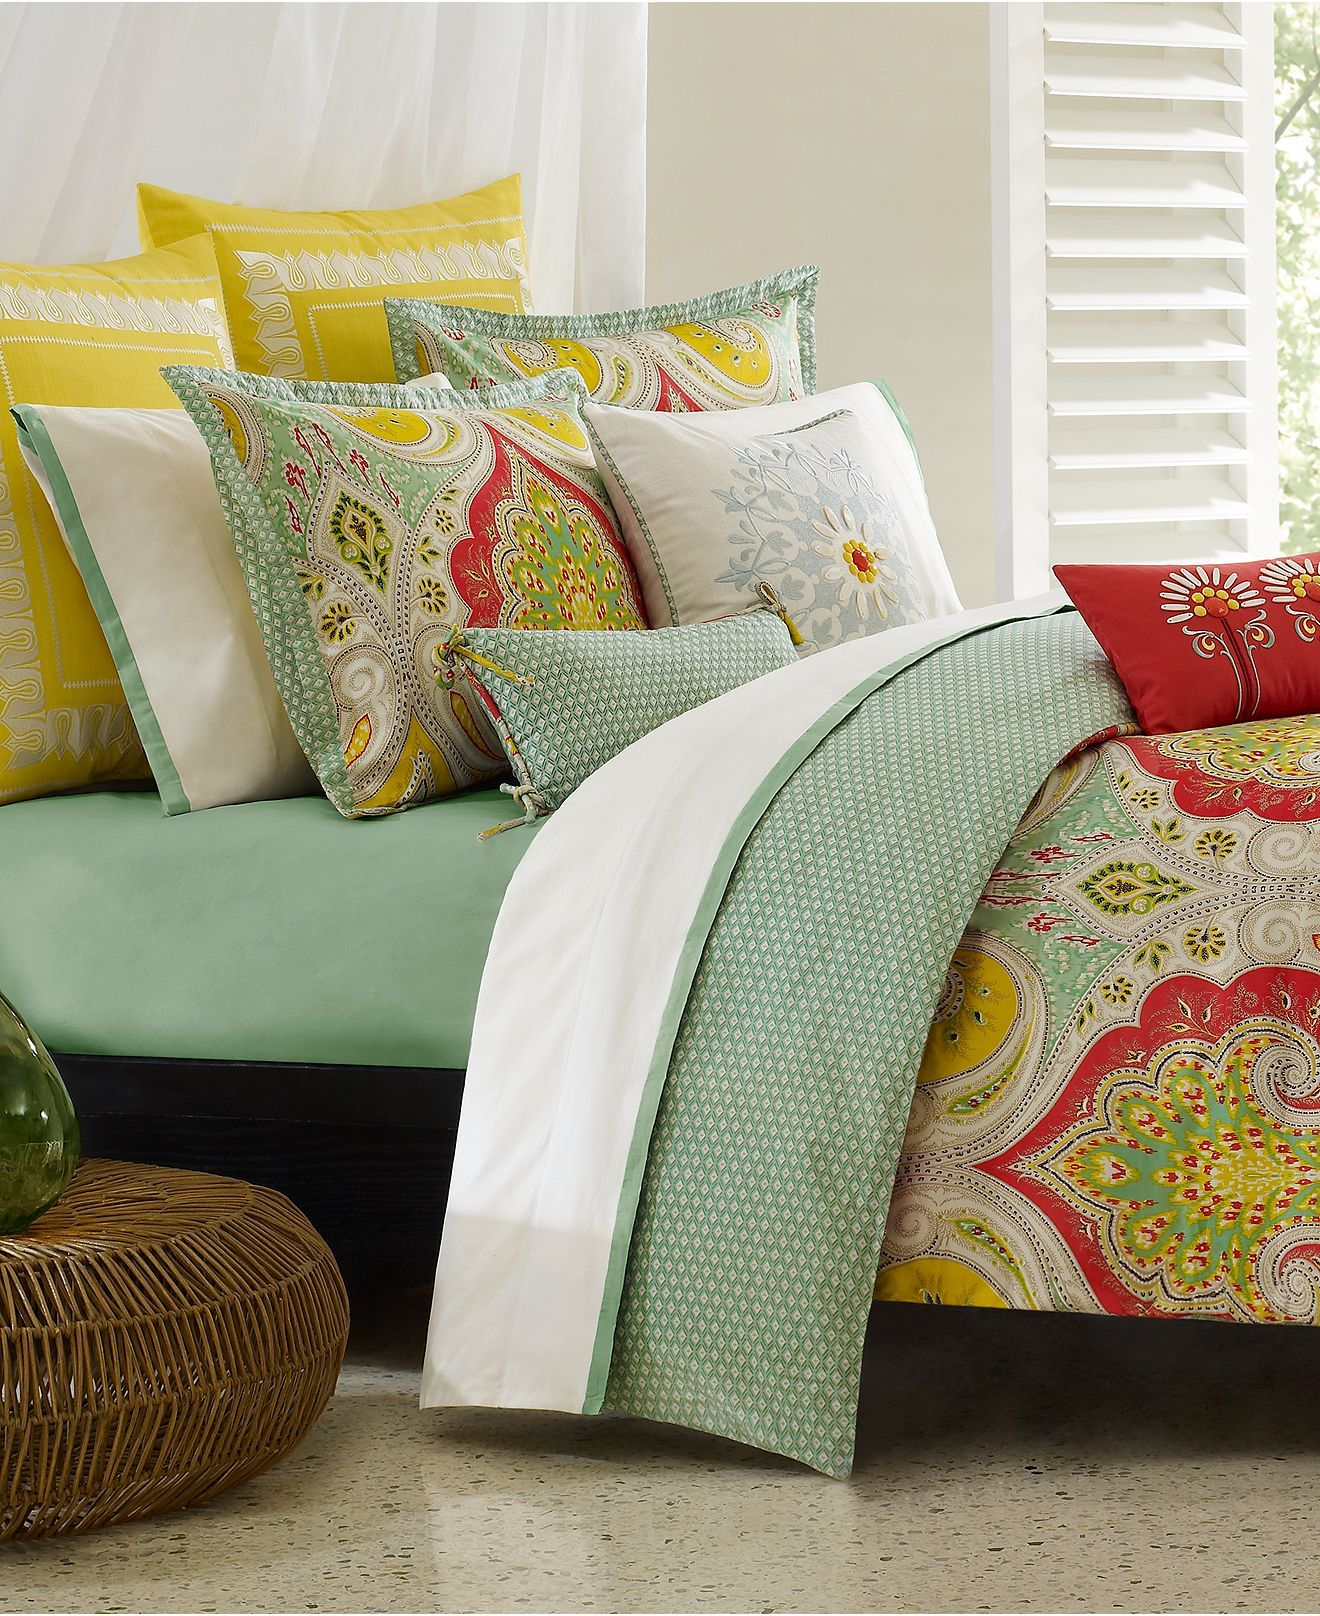 Echo Jaipur Bedding Collection 300 Thread Count Cotton